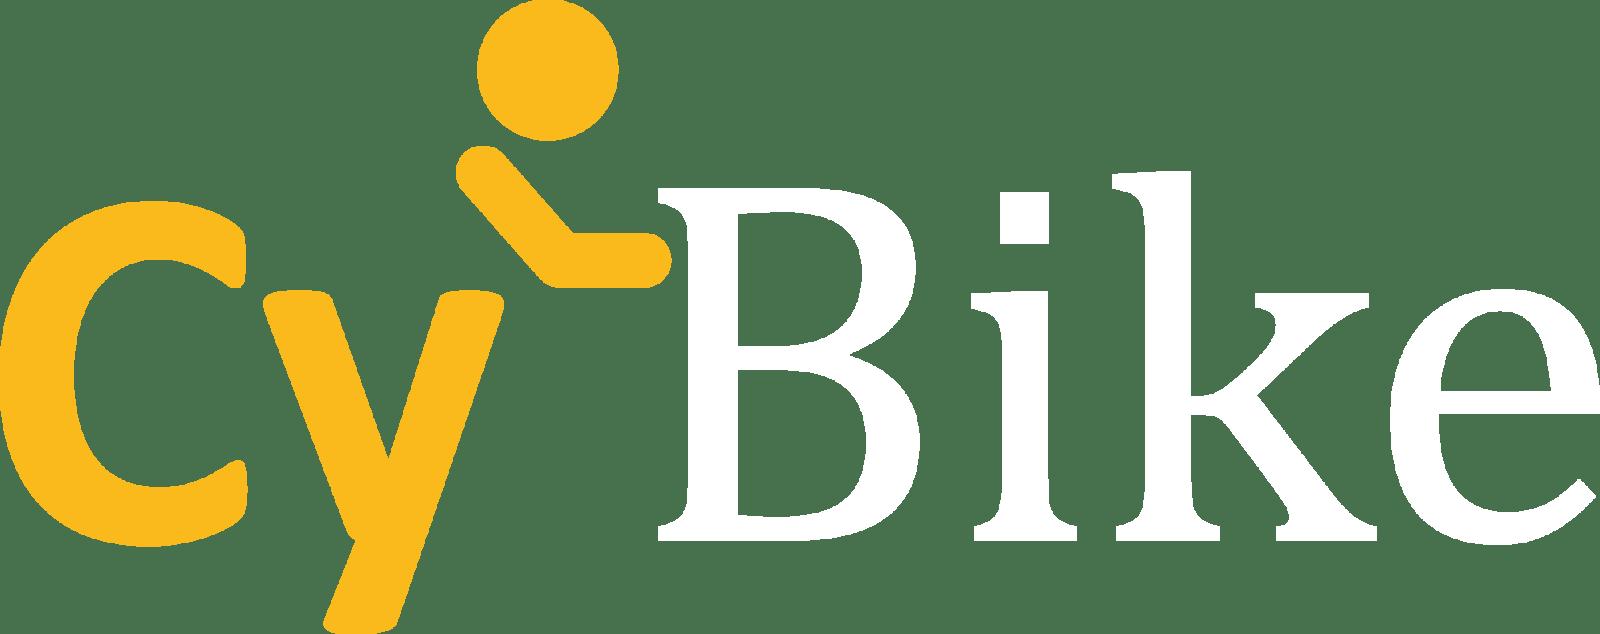 CyBike-Webshop